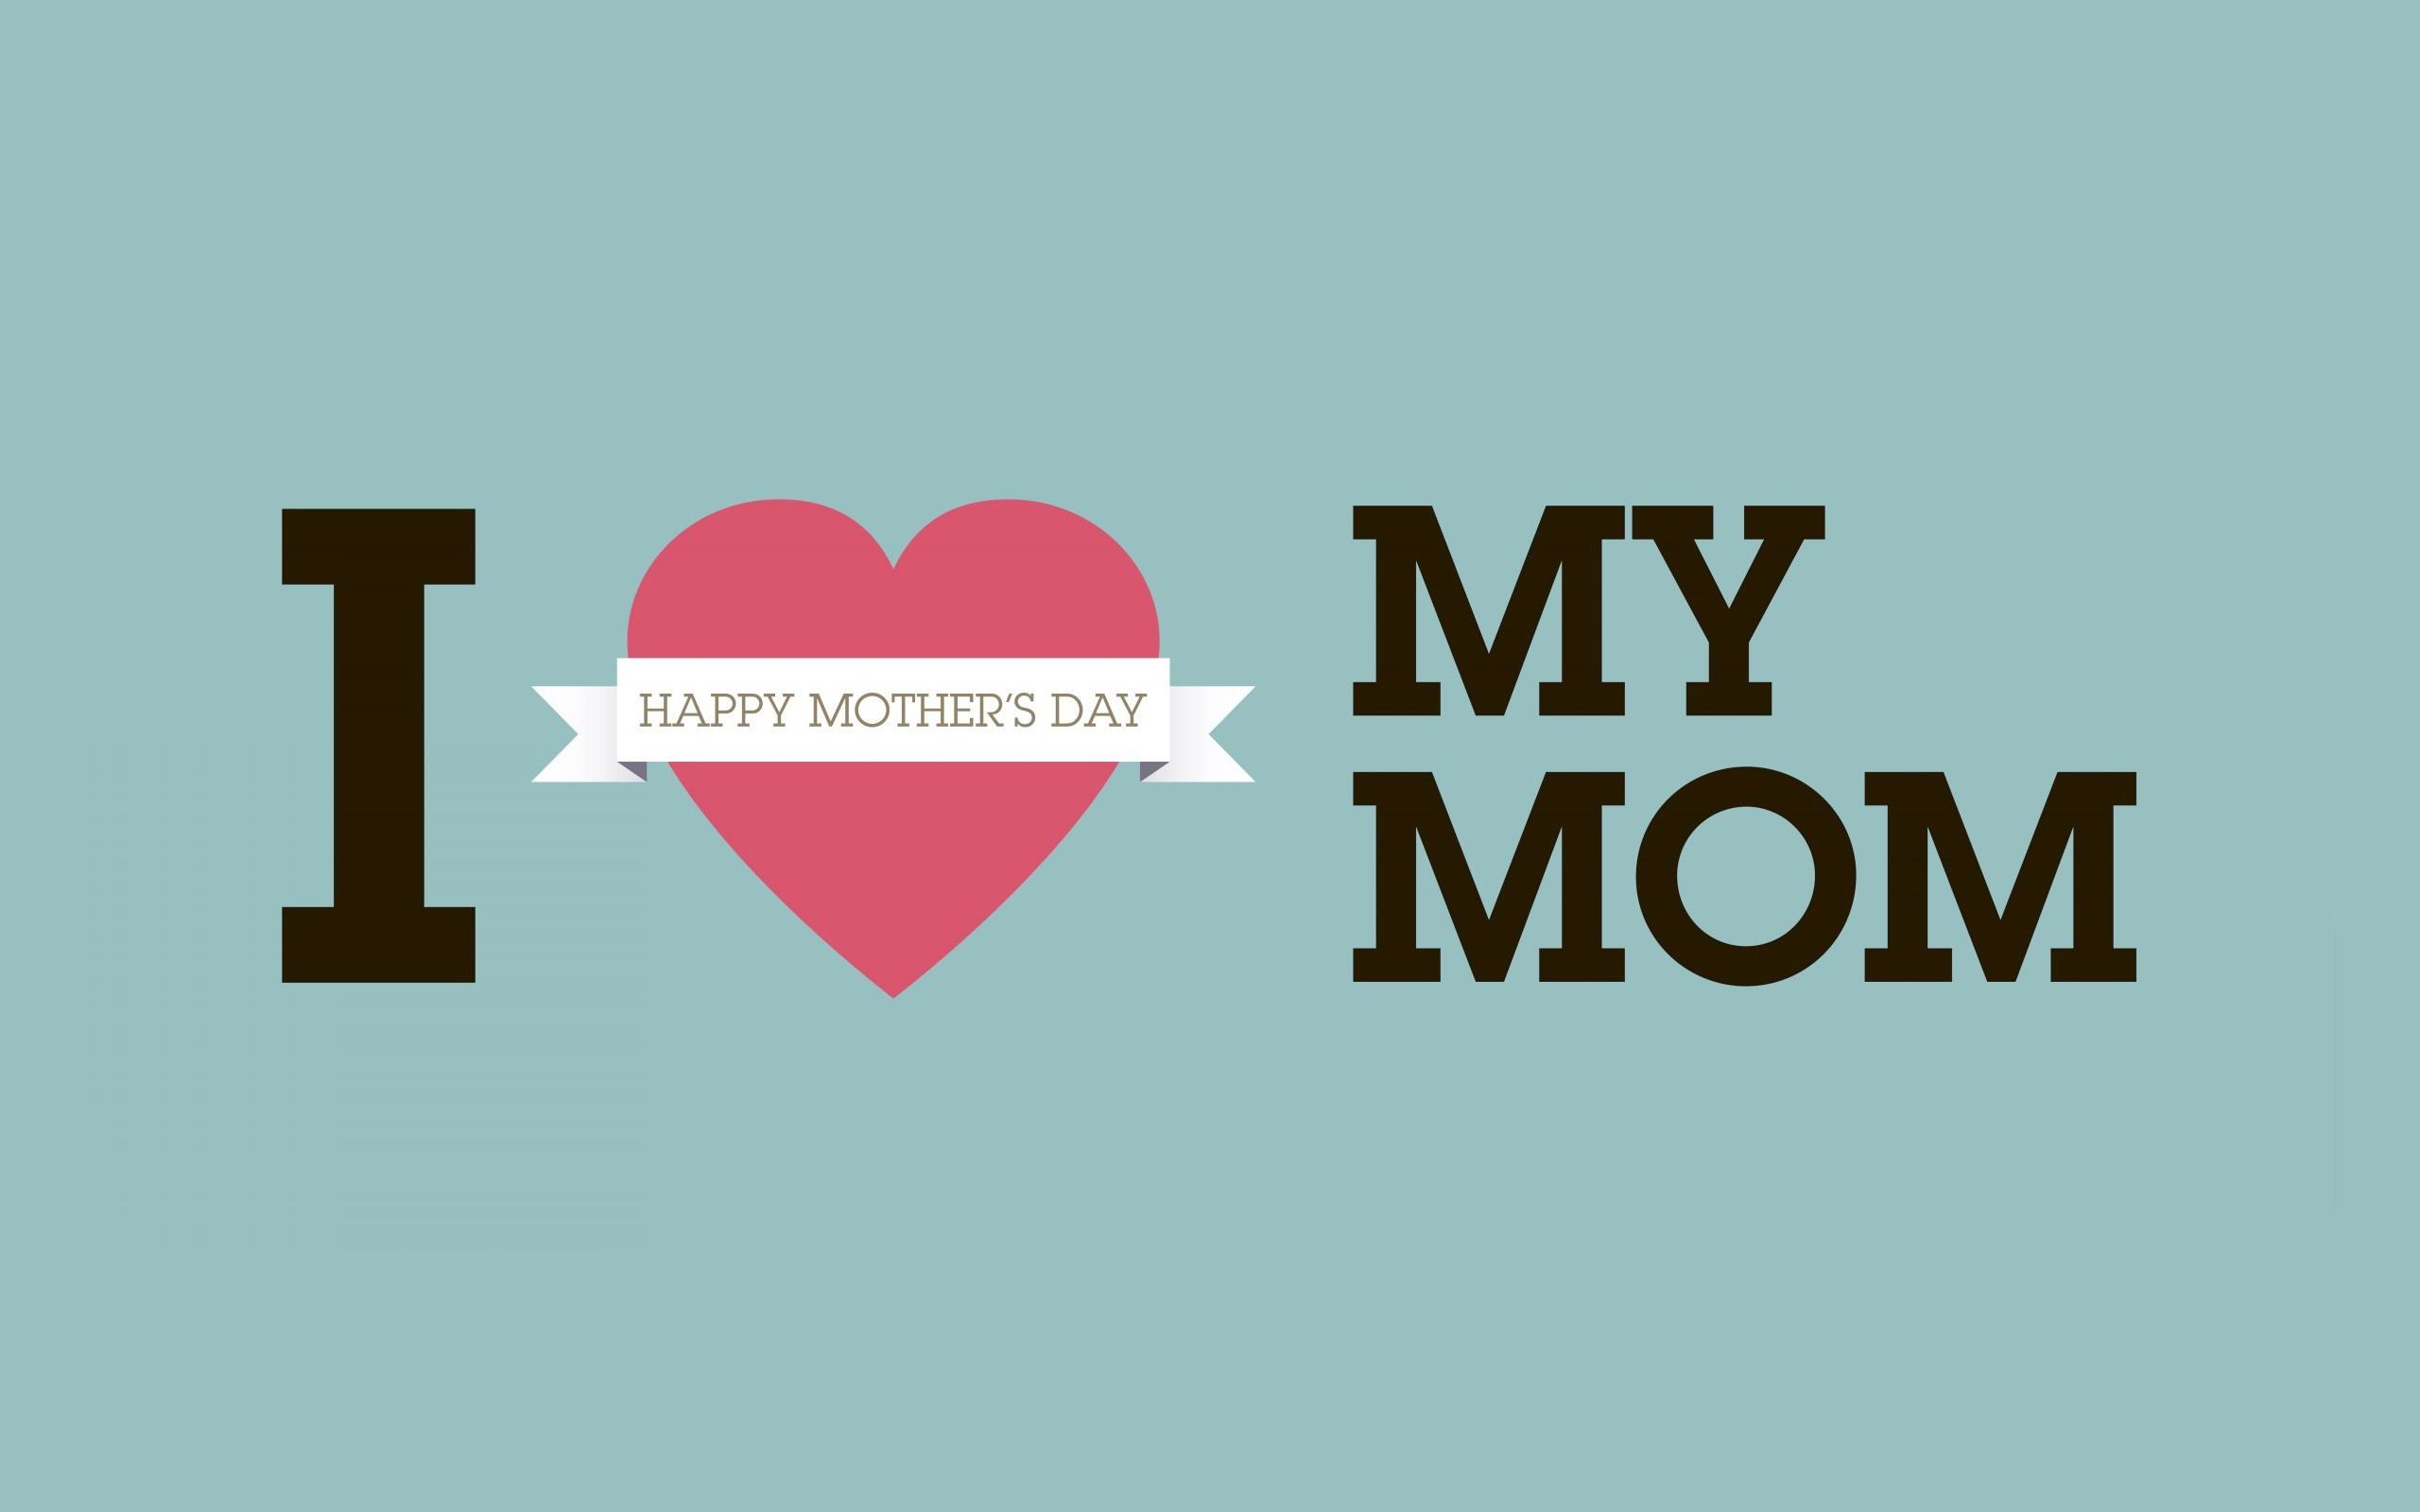 I Love You Mom Image